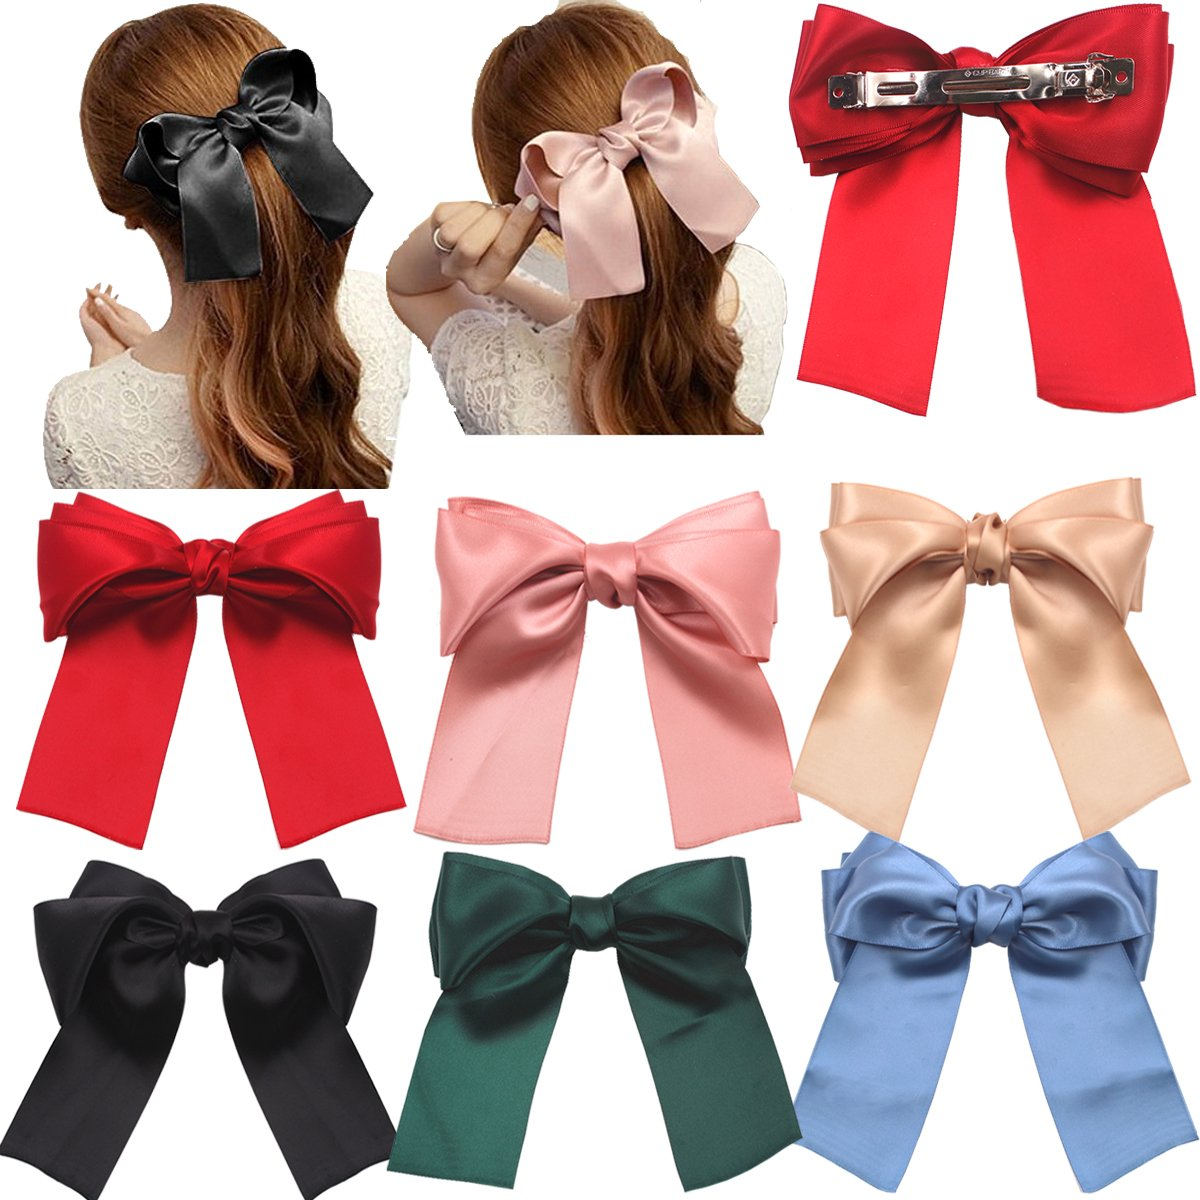 Girls Ladies Large Red Hair Bow Hair Clip